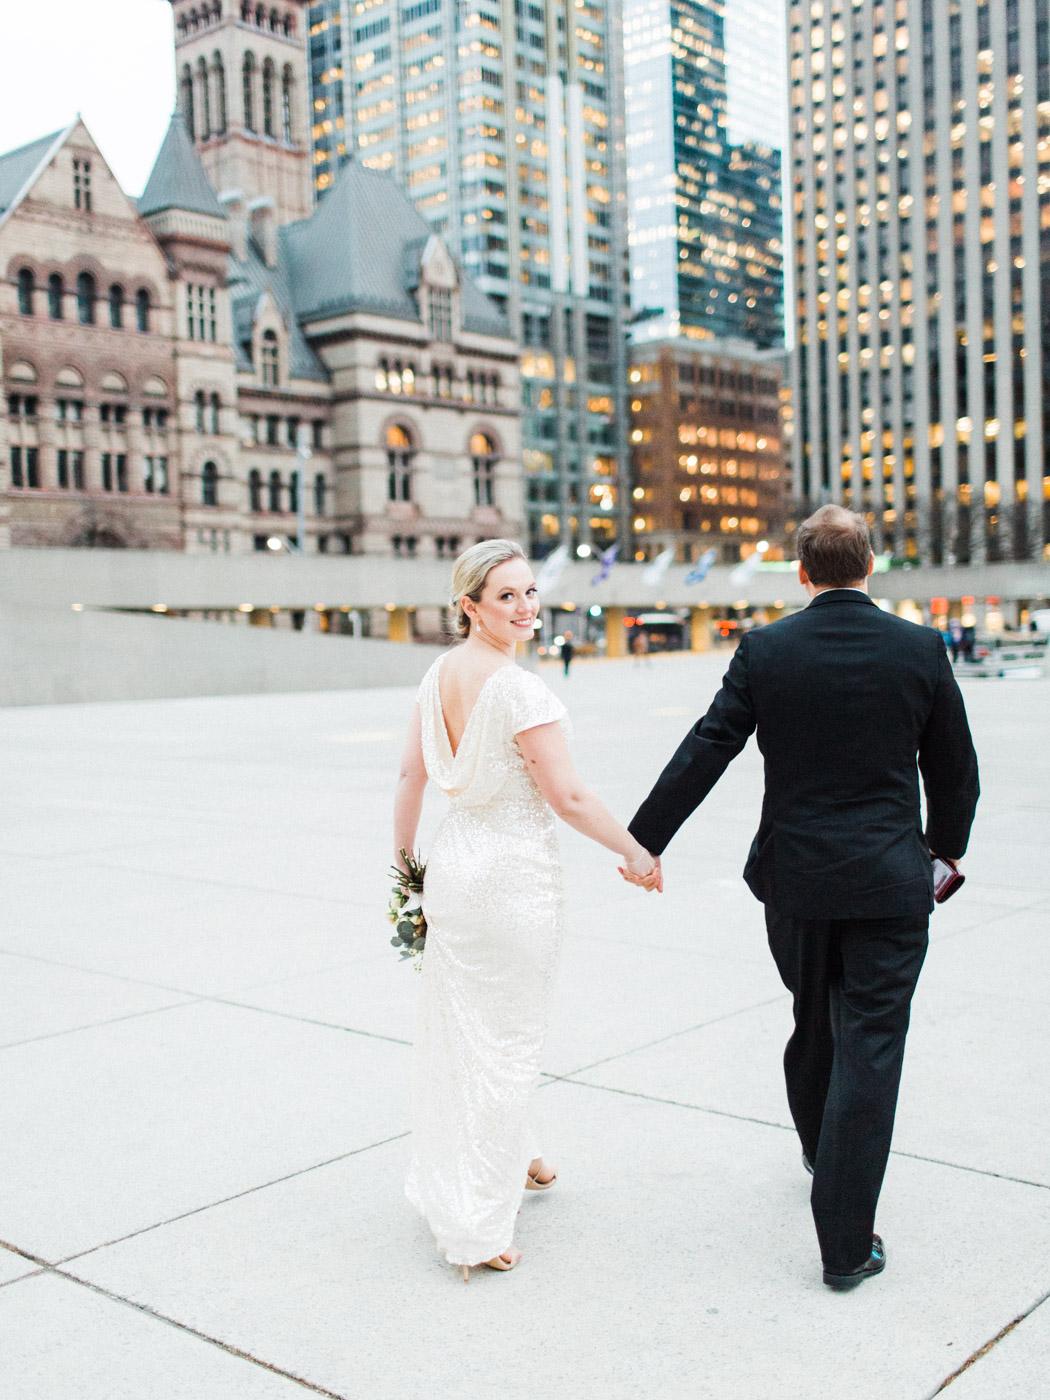 Toronto-Collingwood-Muskoka-Wedding-photographer-planning-tips-for-your-winter-wedding3.jpg